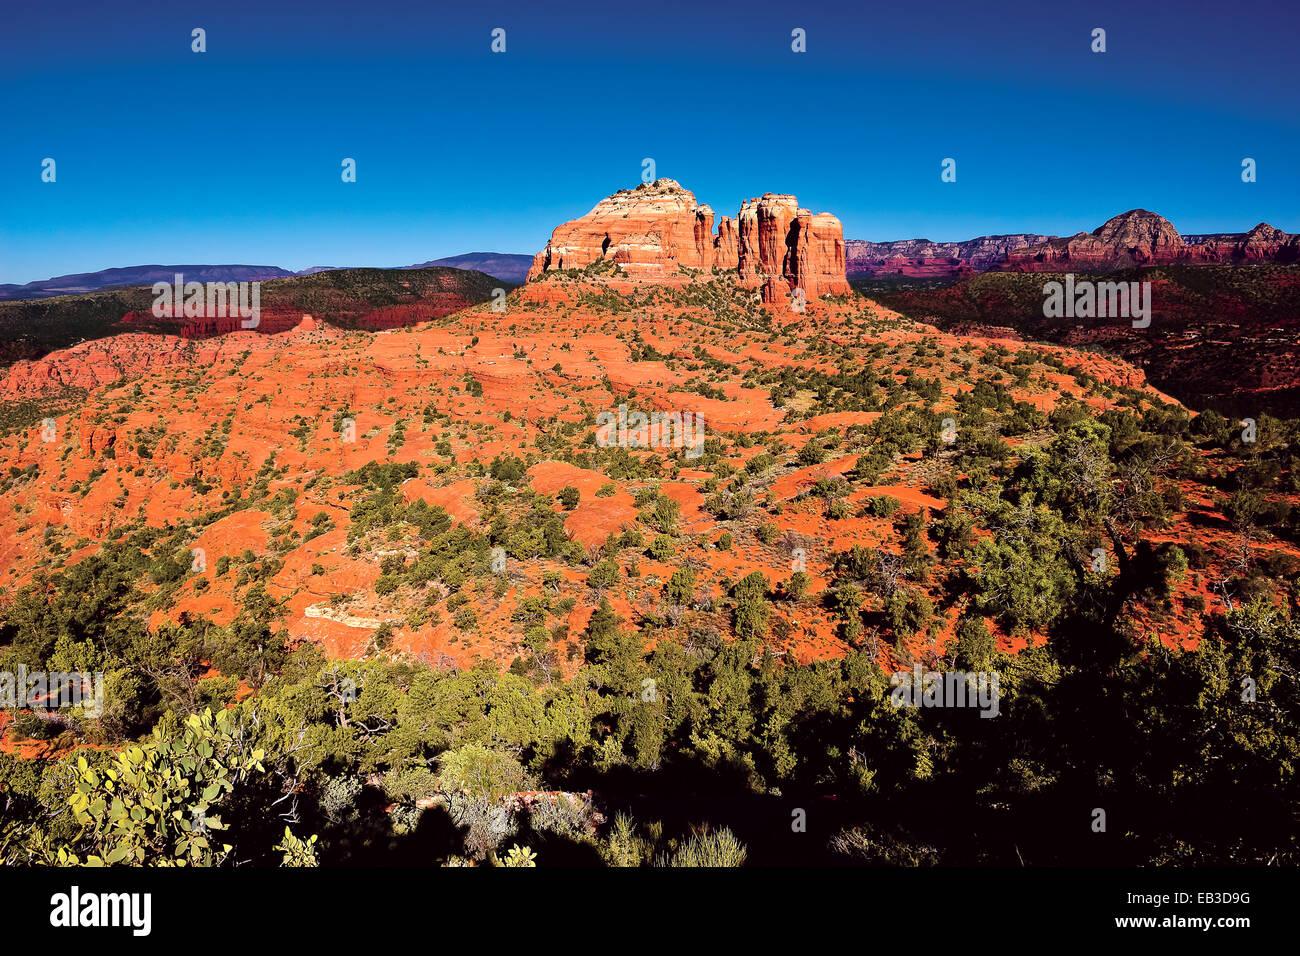 USA, Arizona, Yavapai County, Sedona, Cathedral Rock viewed from Hiline Trail Vista east side - Stock Image